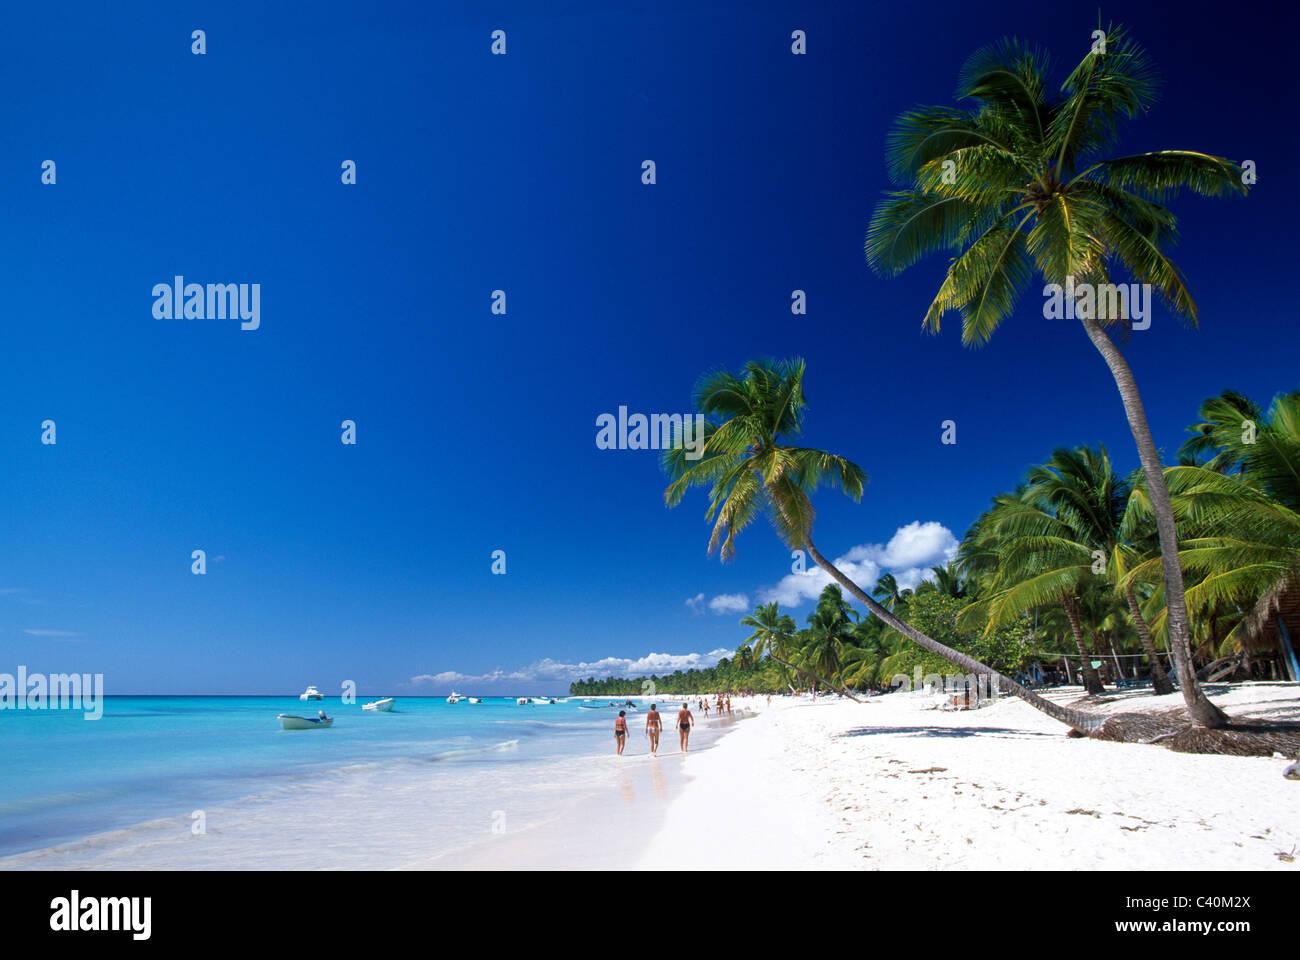 Fuera, la Catedral Dome, Rep, la República Dominicana, al aire libre, fuera de la isla, Isla Saona, Isla Saona, Imagen De Stock